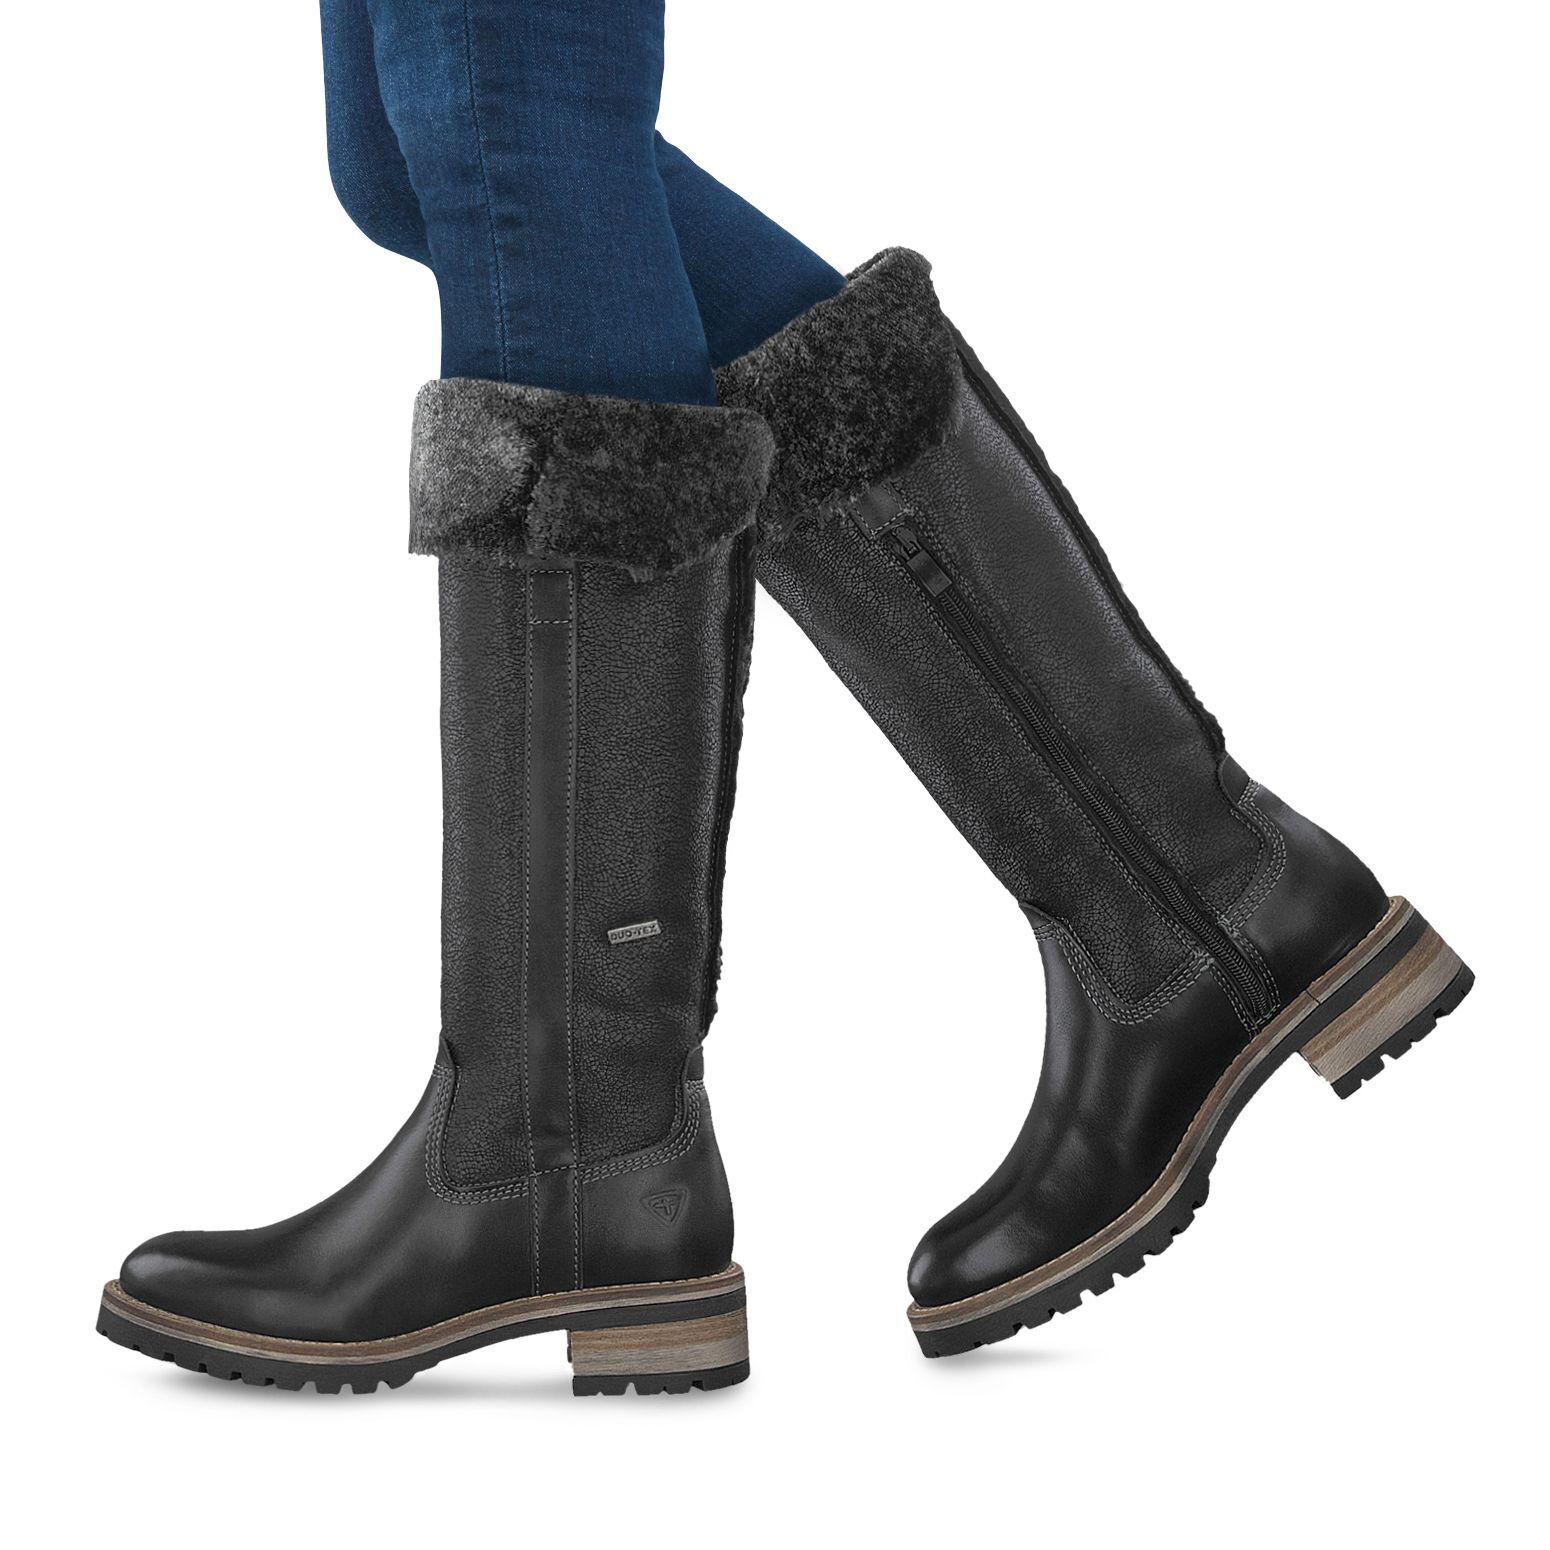 Chaussures Femmes Chaussures Bottes Femmes Bottes Chaussures Femmes Chaussures Tamaris Tamaris Bottes Tamaris Femmes Tamaris Rj3L5A4